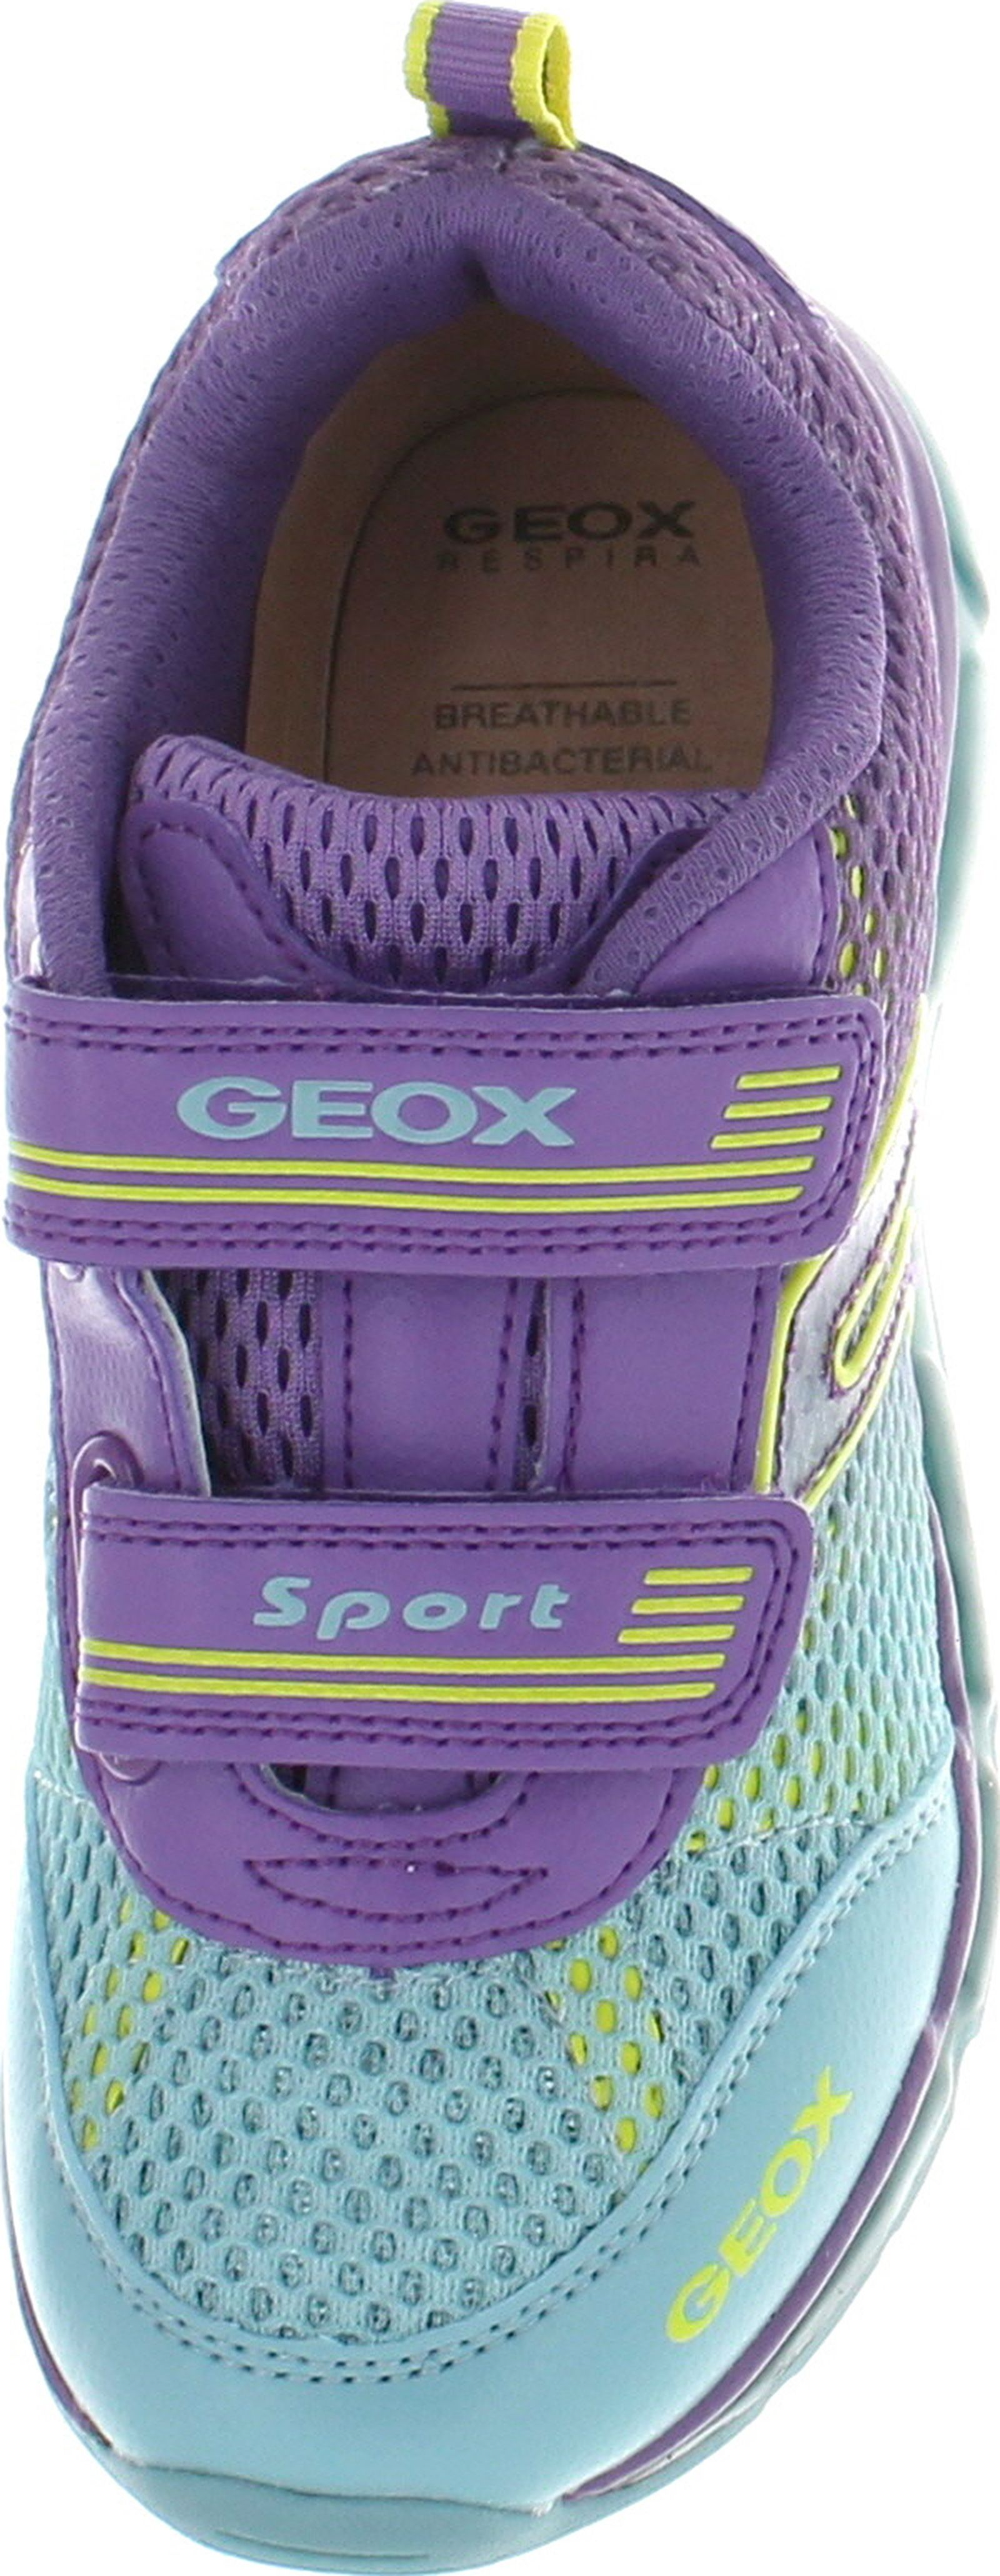 comerciante Fatídico cruzar  GEOX Girls Jr Android Girl Fashion Sneakers | eBay